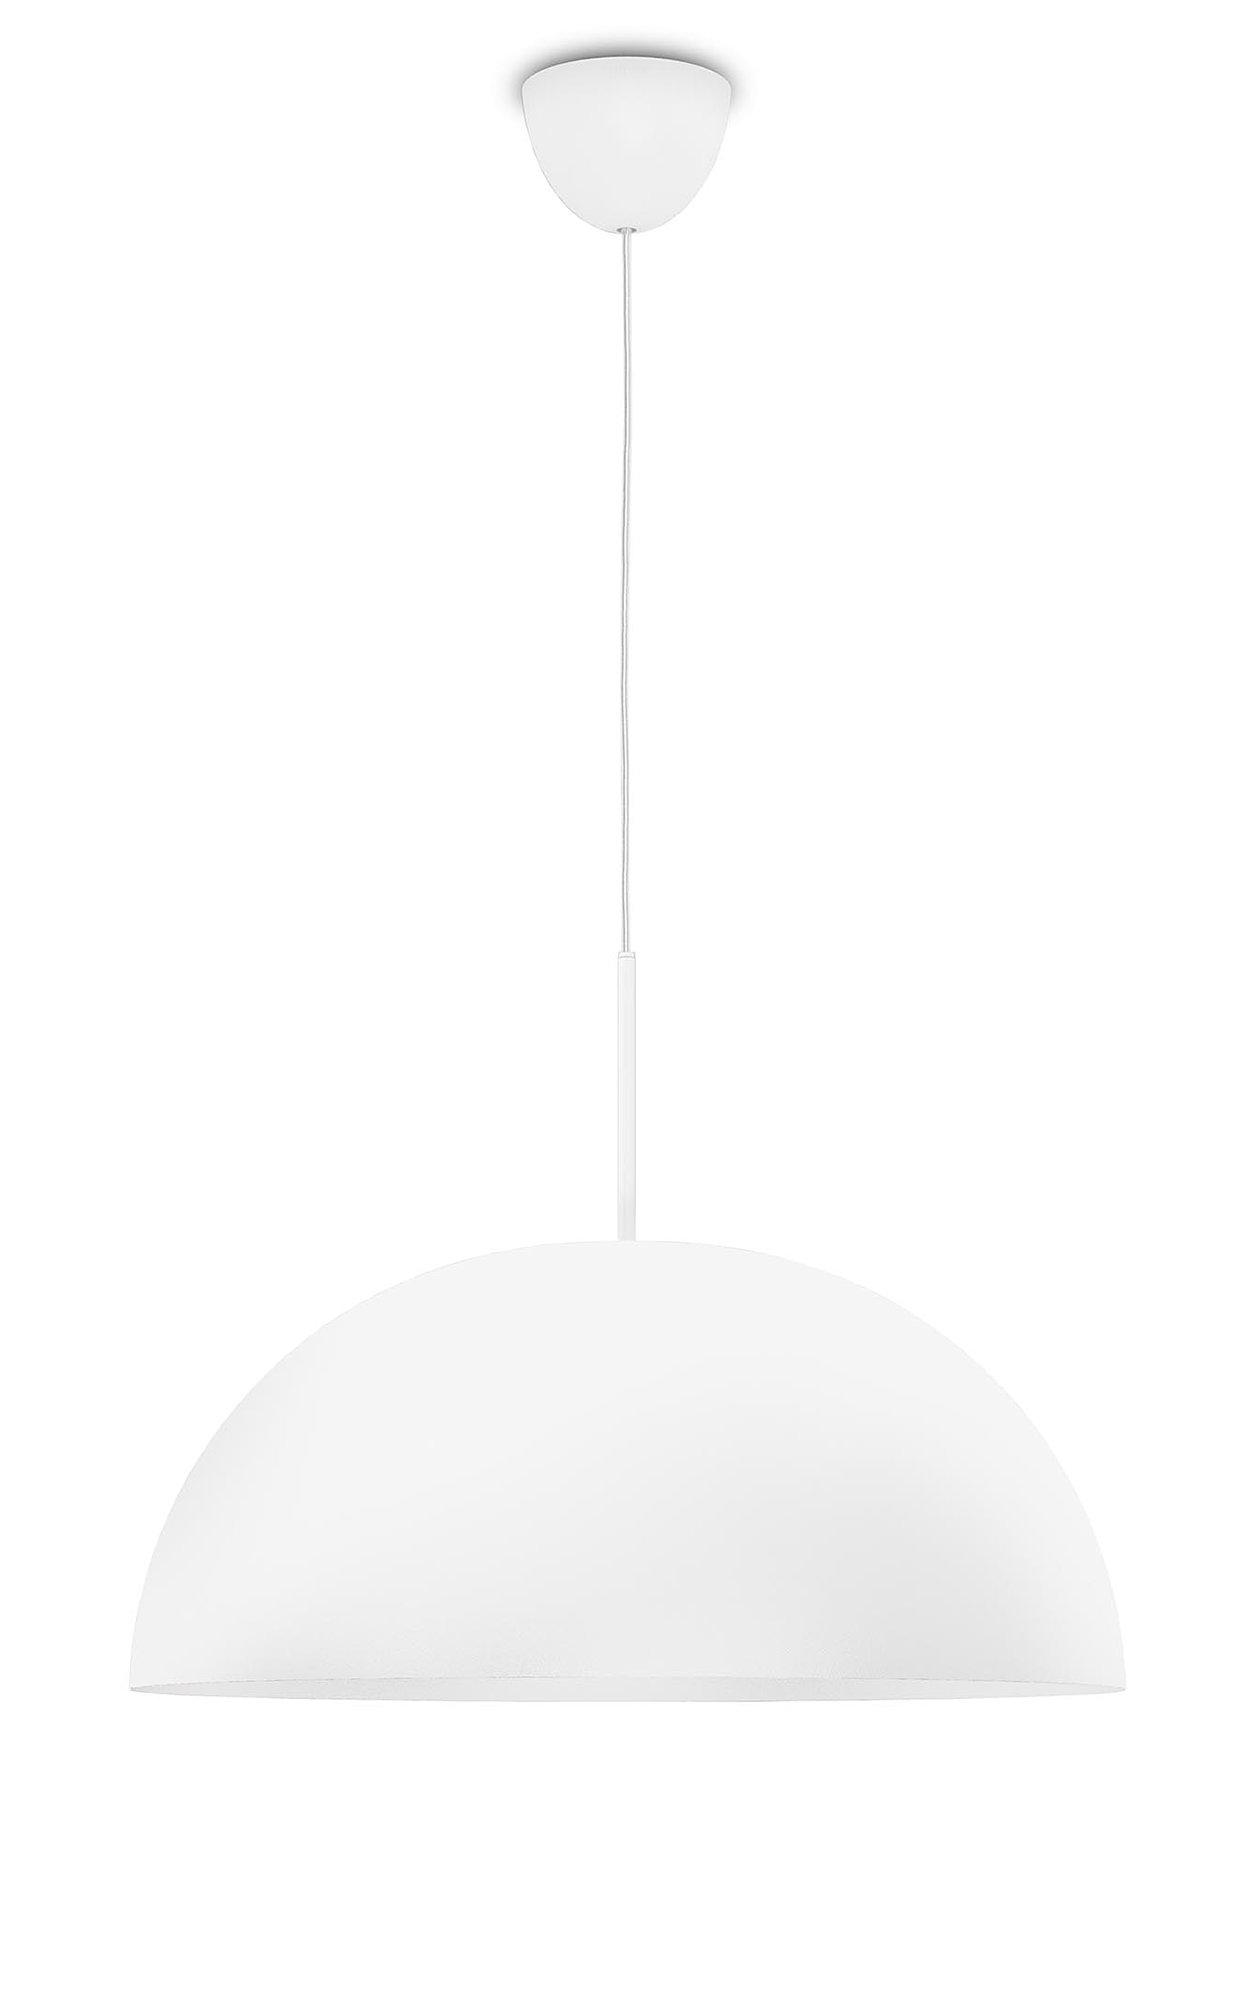 Myliving Suspension Light 409073116 Philips